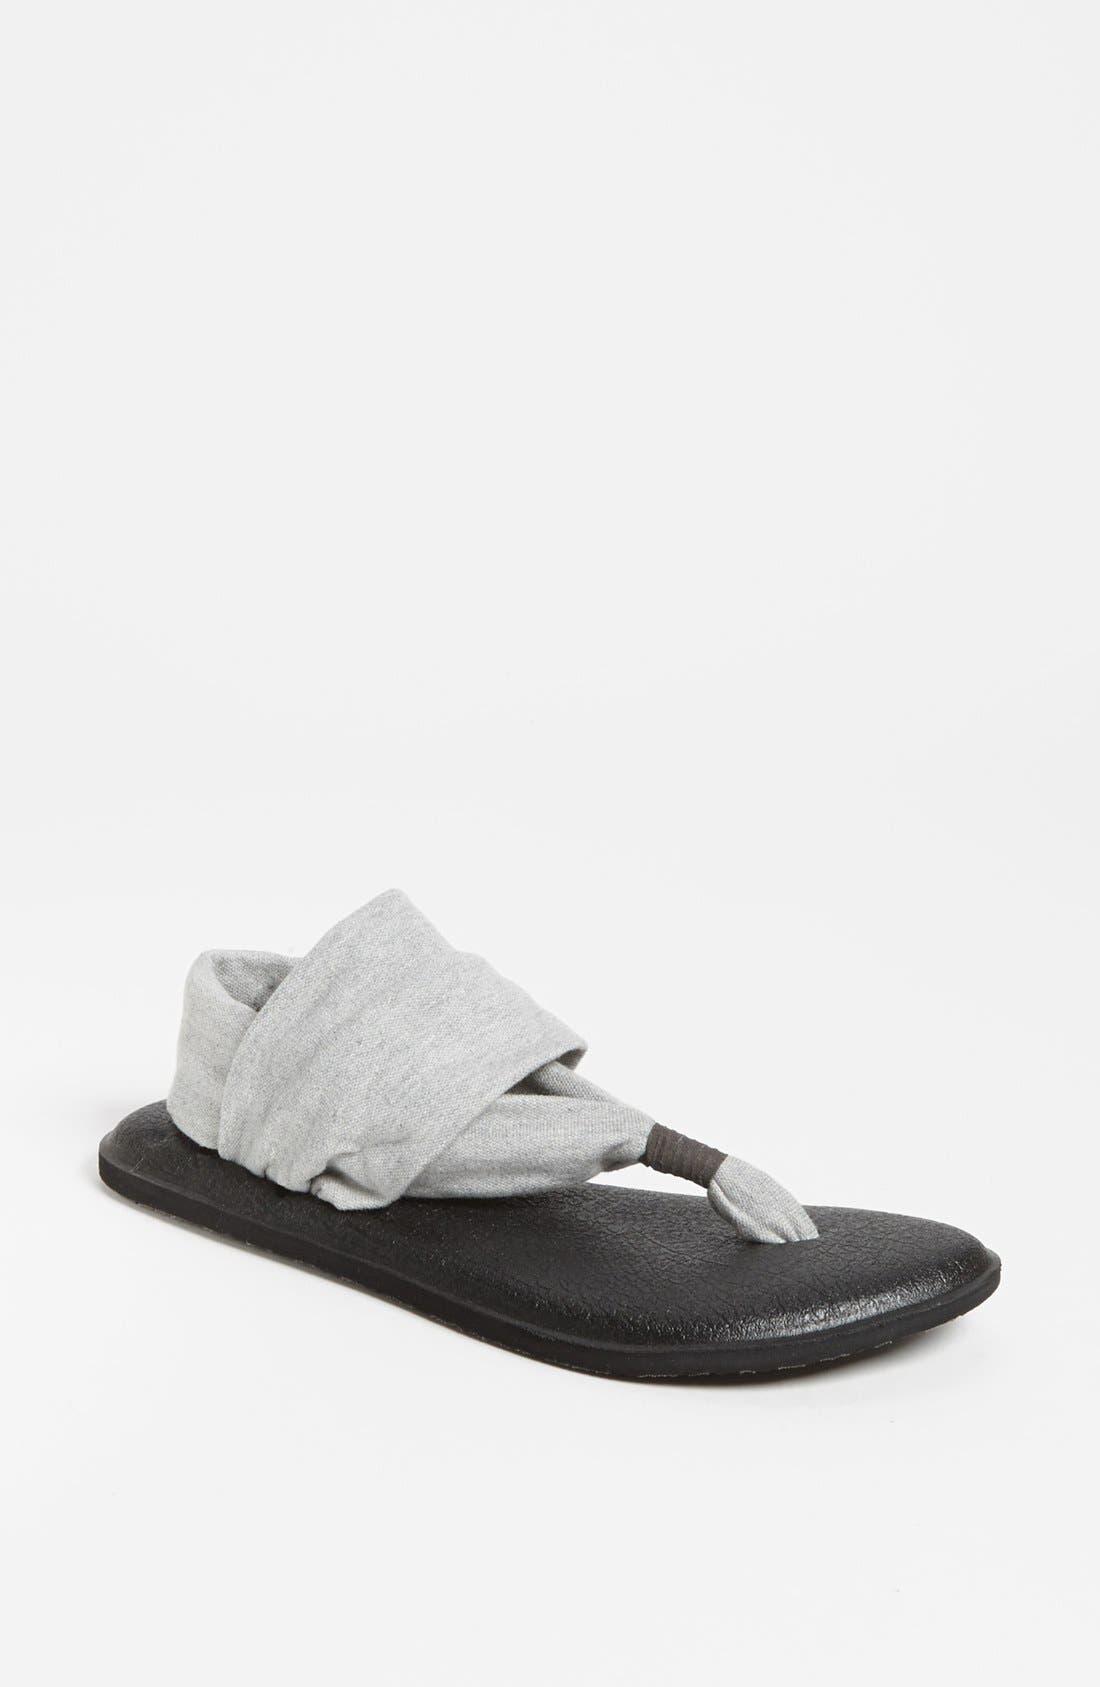 Main Image - Sanuk 'Yoga Sling' Sandal (Women)